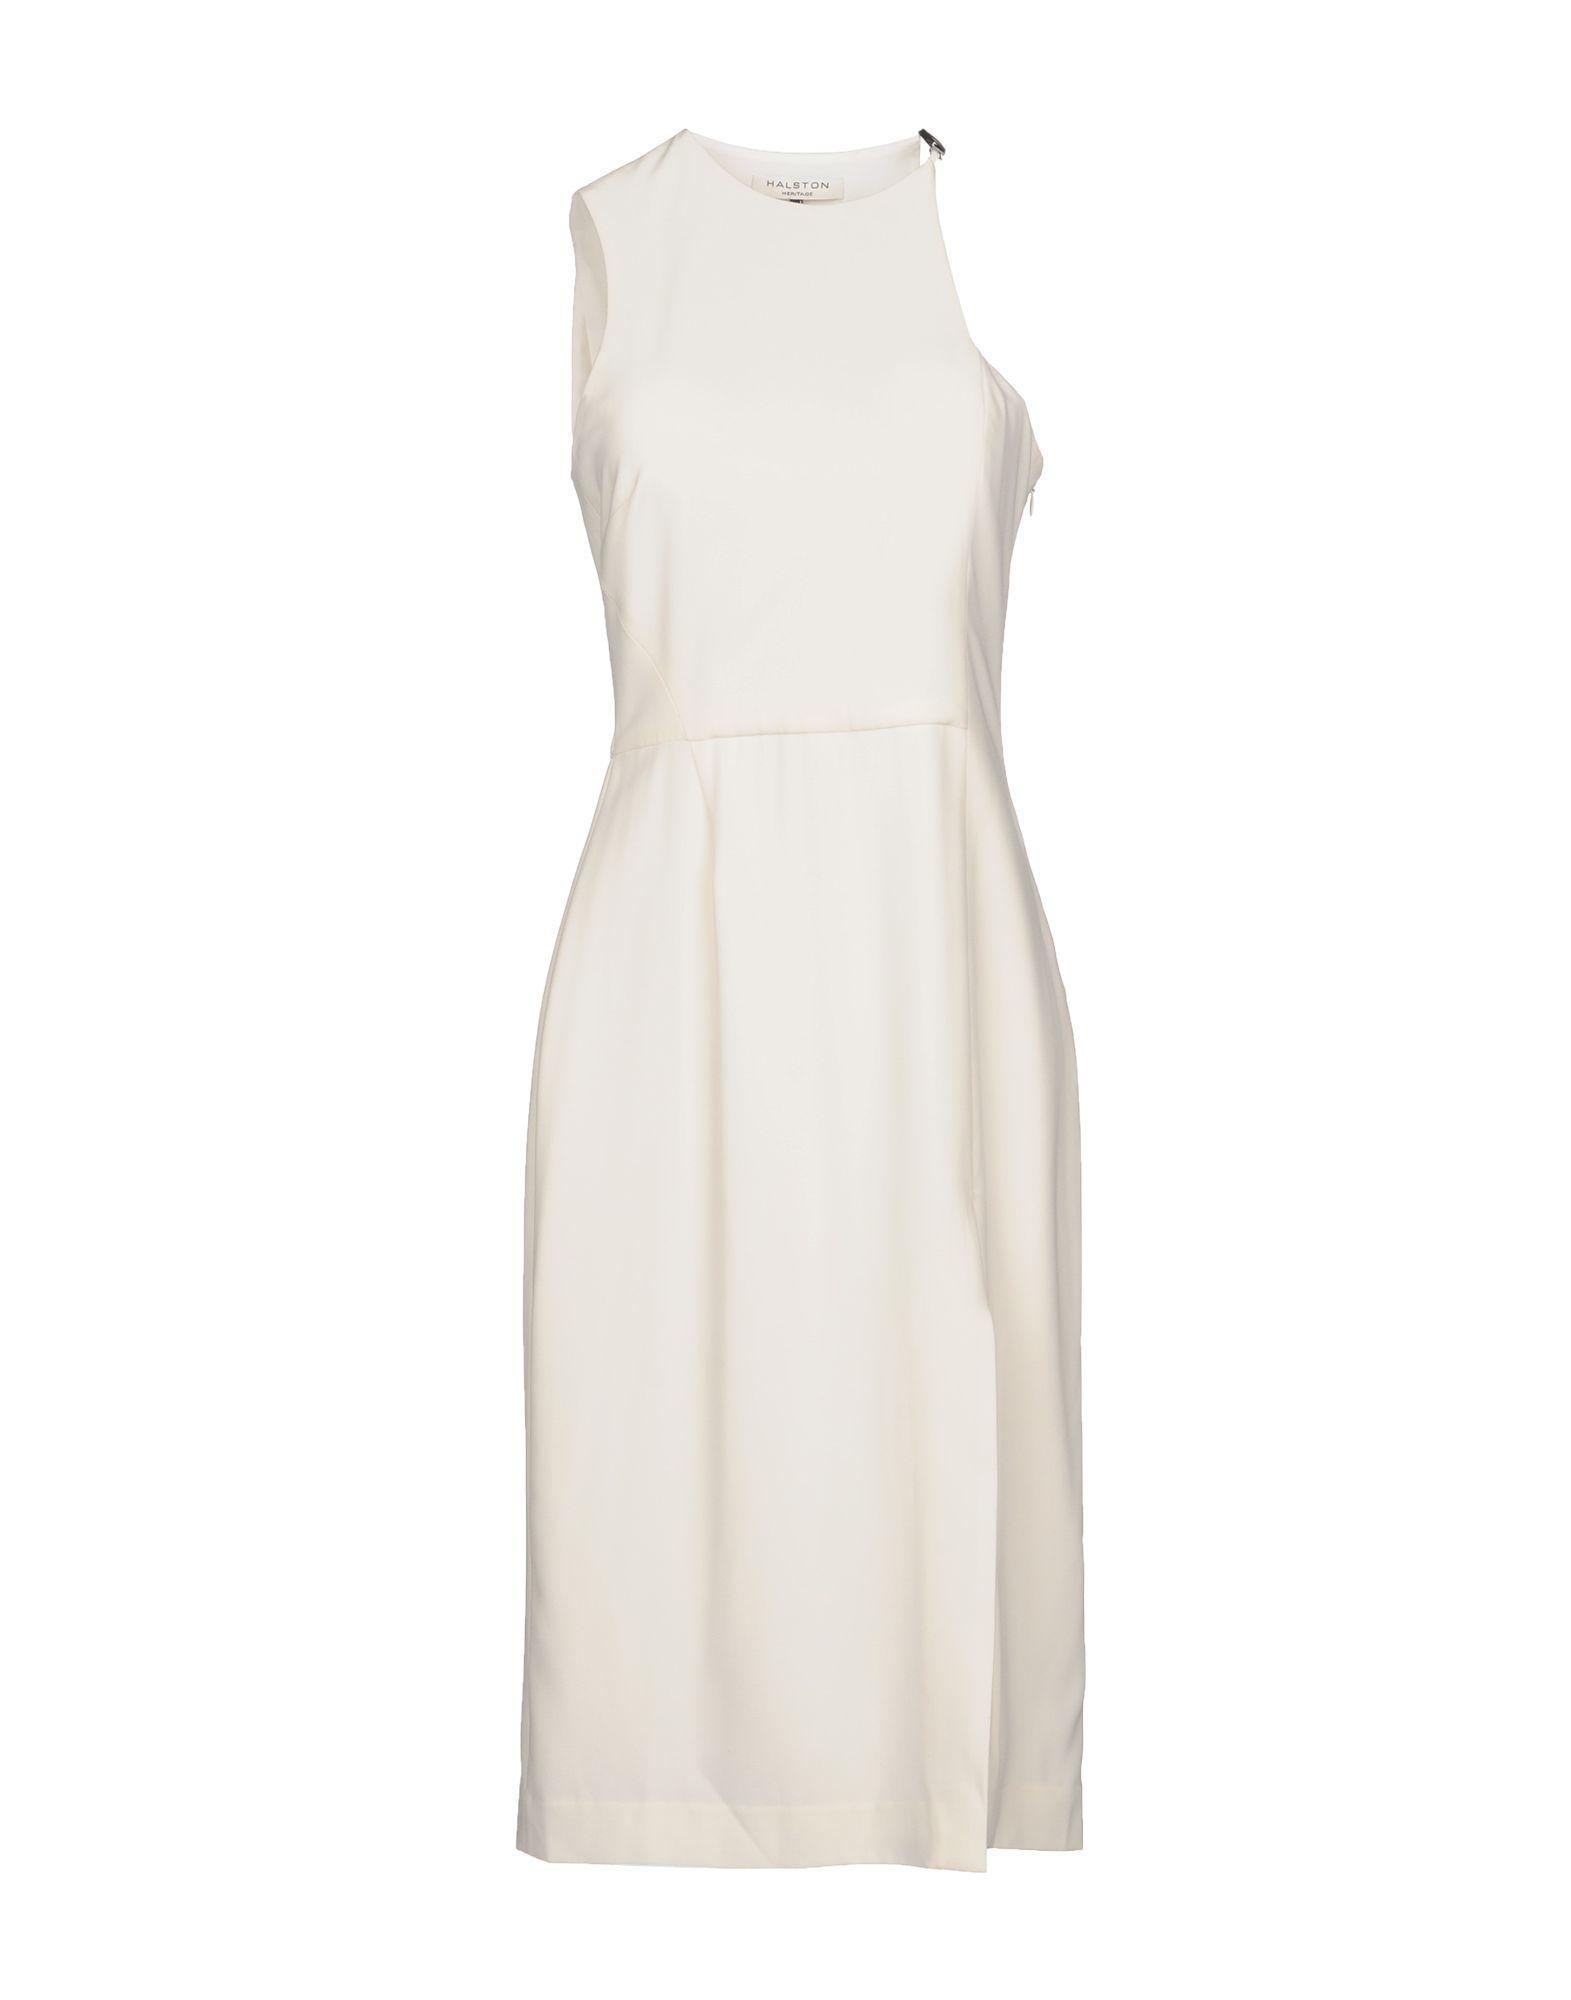 Halston Heritage Short Dress In Ivory